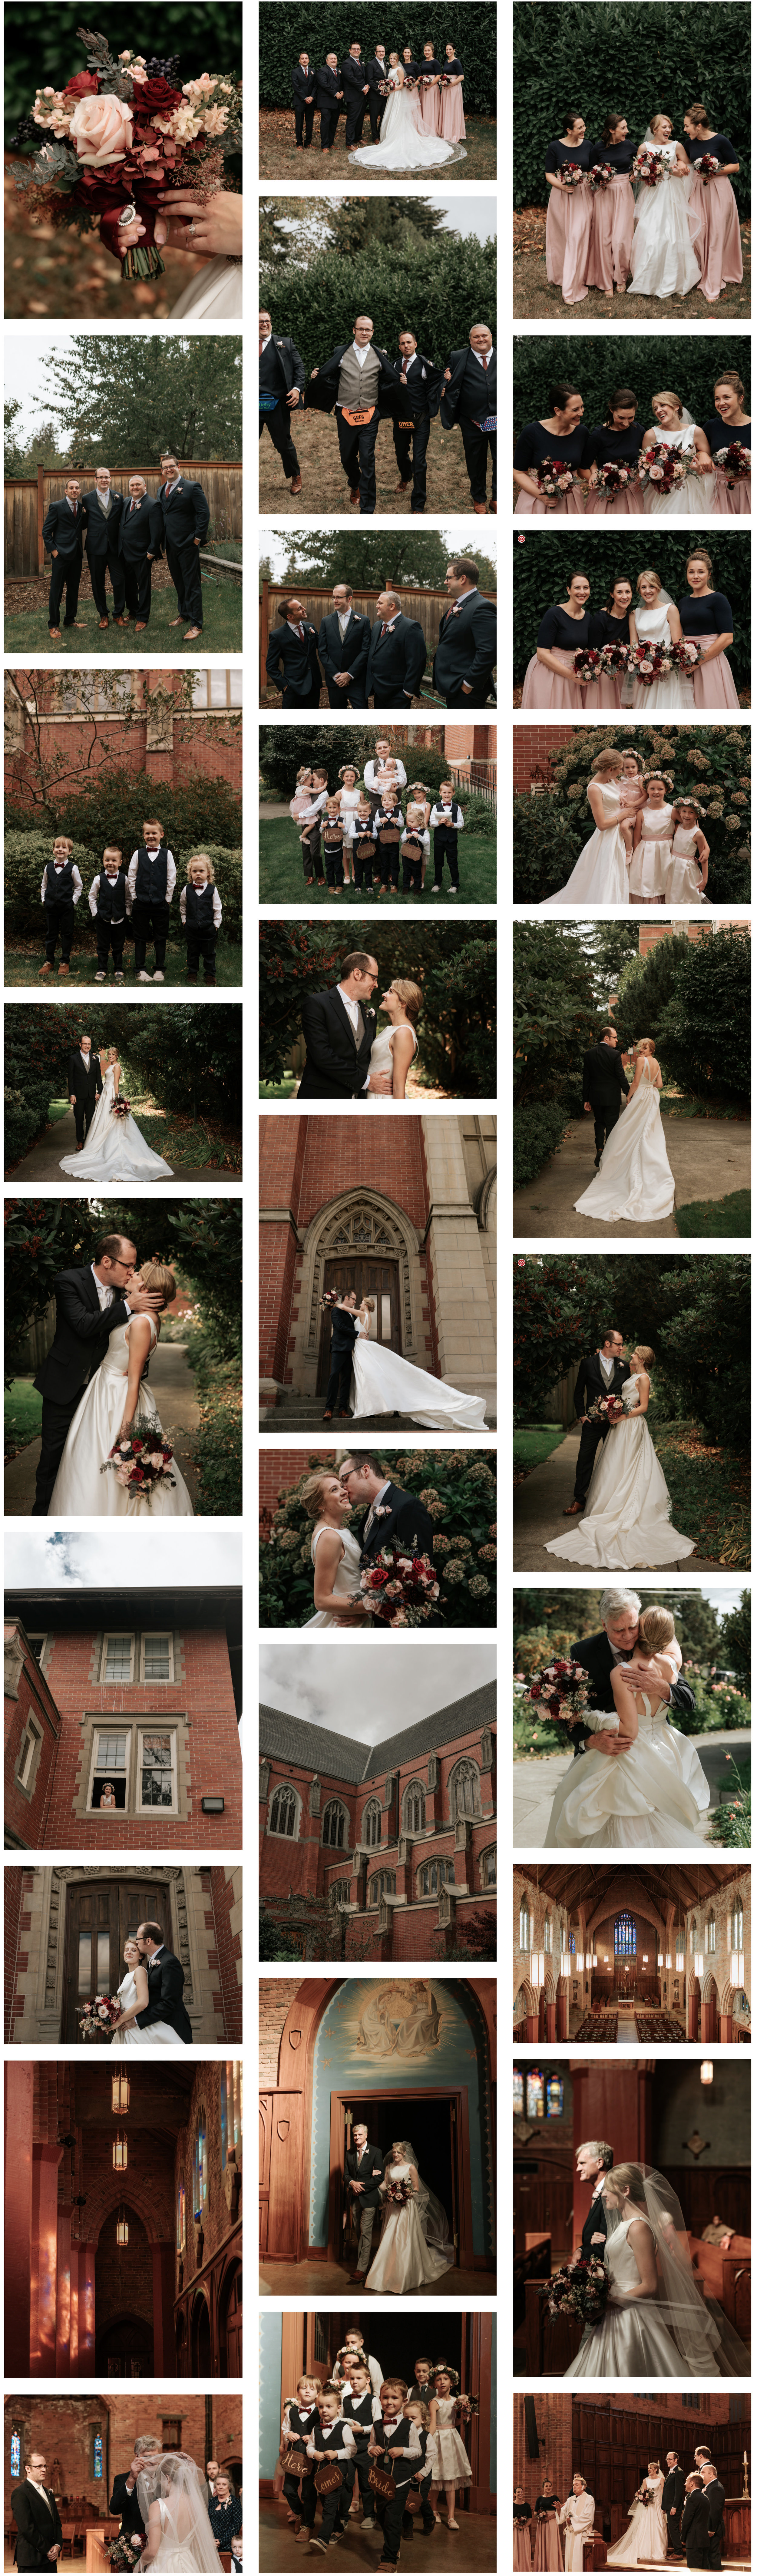 rainier country club wedding 3.jpg